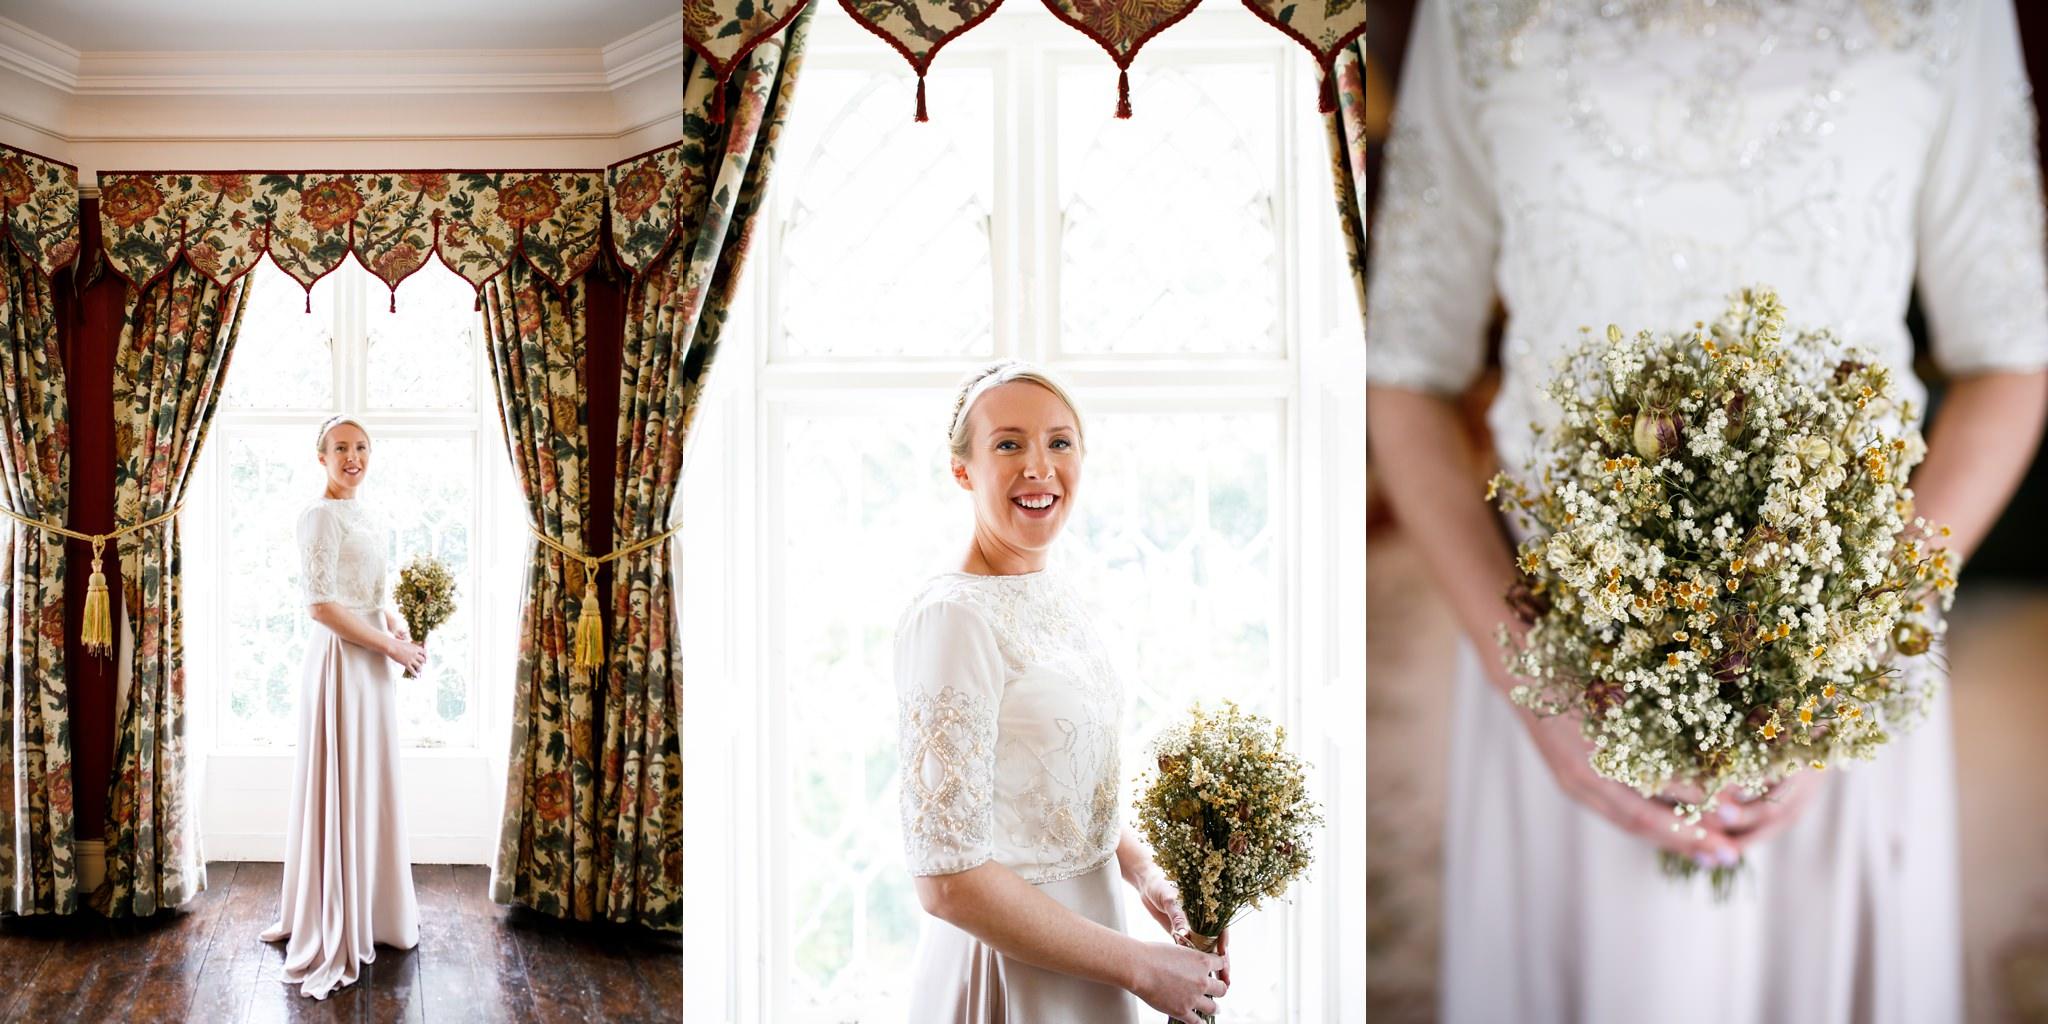 Elisha-Clarke-Photography-Dublin-City-Wedding_0049.jpg